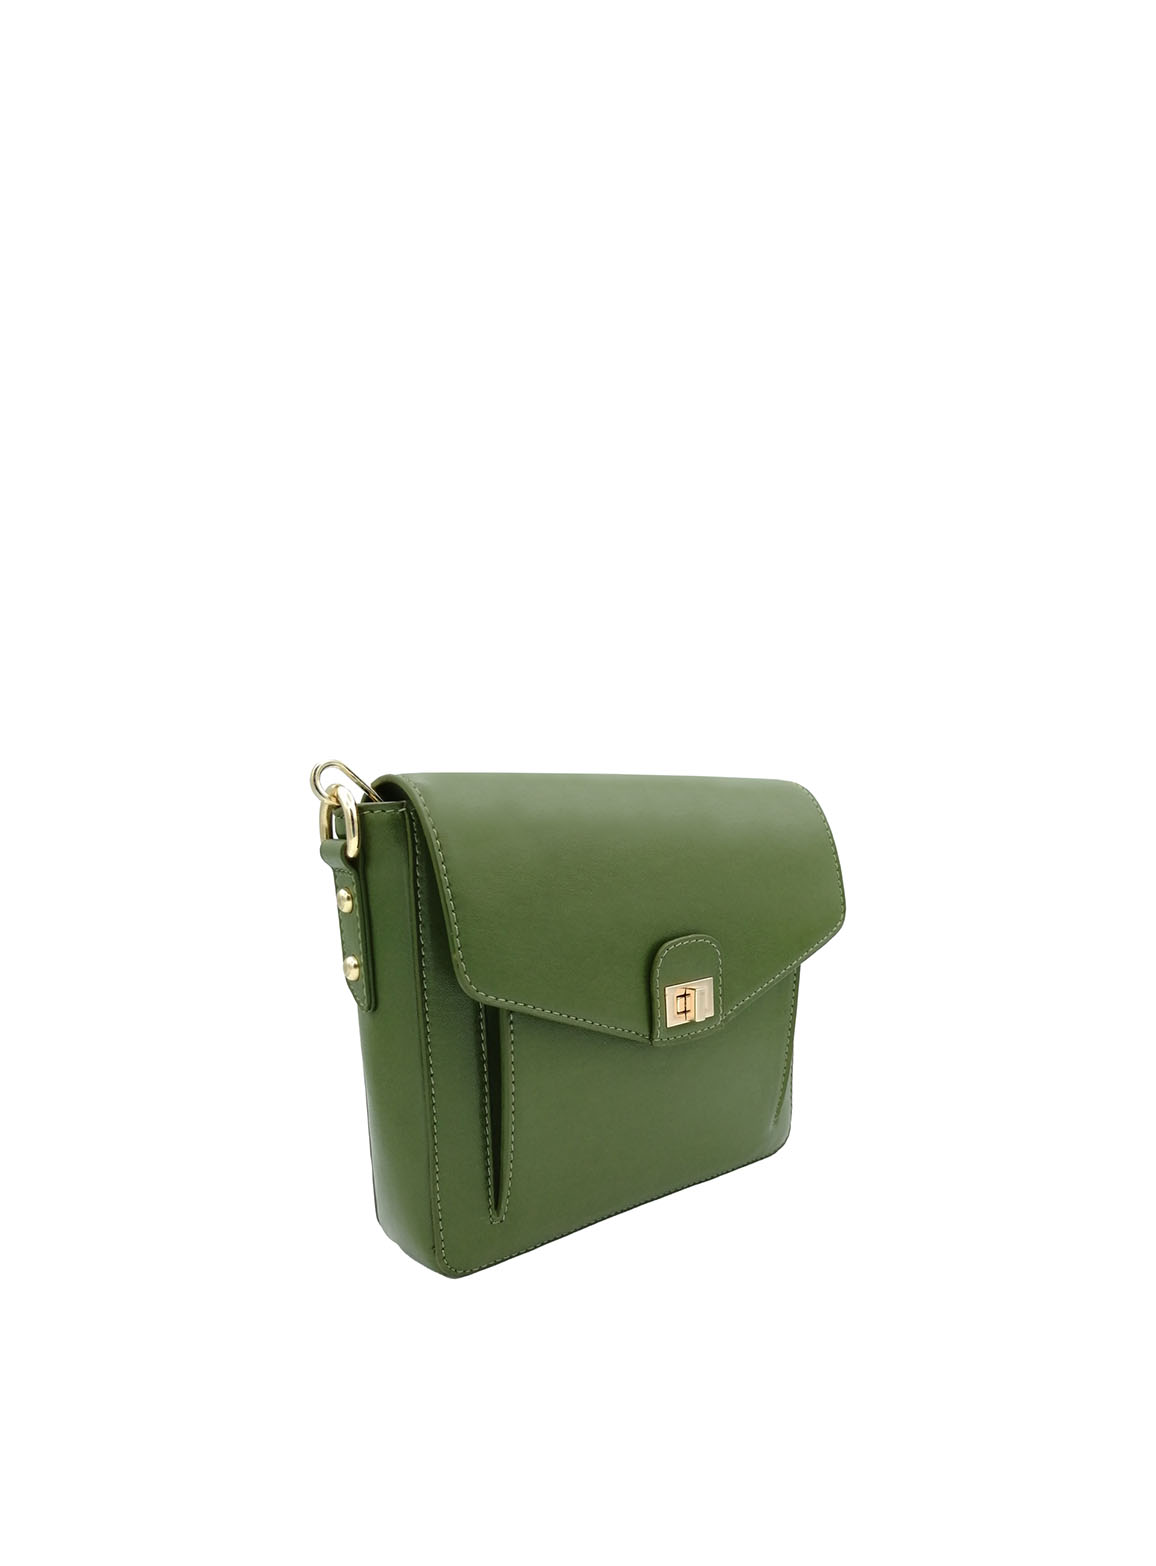 Faustine bag